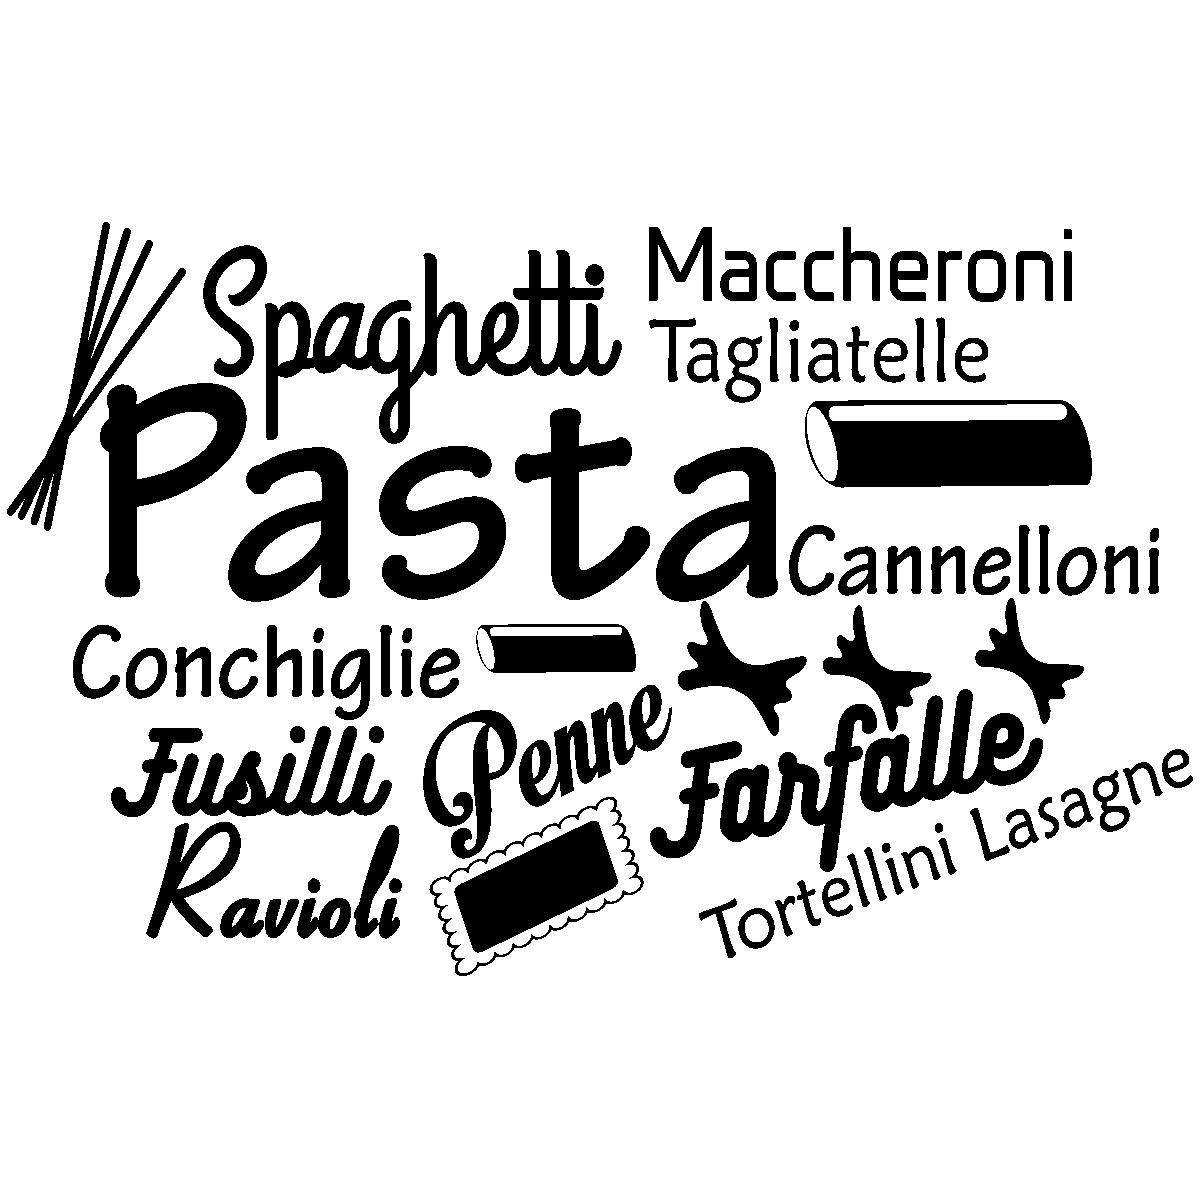 Sticker citation cuisine spaghetti maccheroni pasta for Stickers cuisine citation